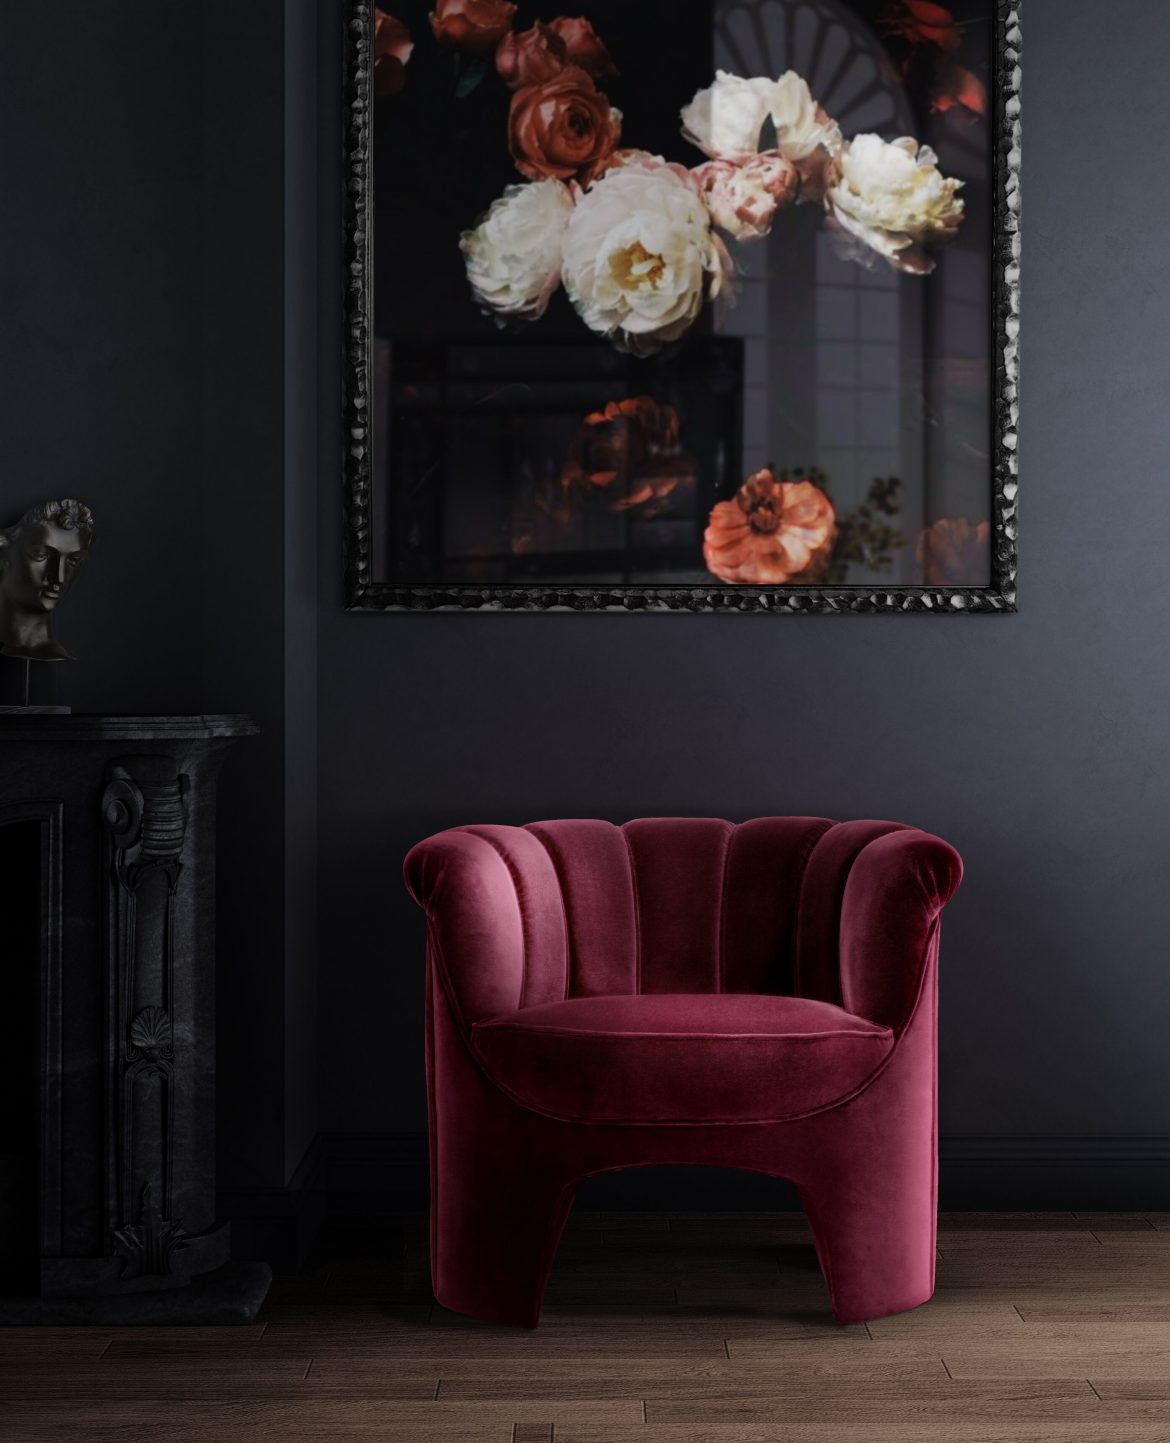 living room ideas 30 Best Living Room Ideas For 2020 best living room ideas 2020 4